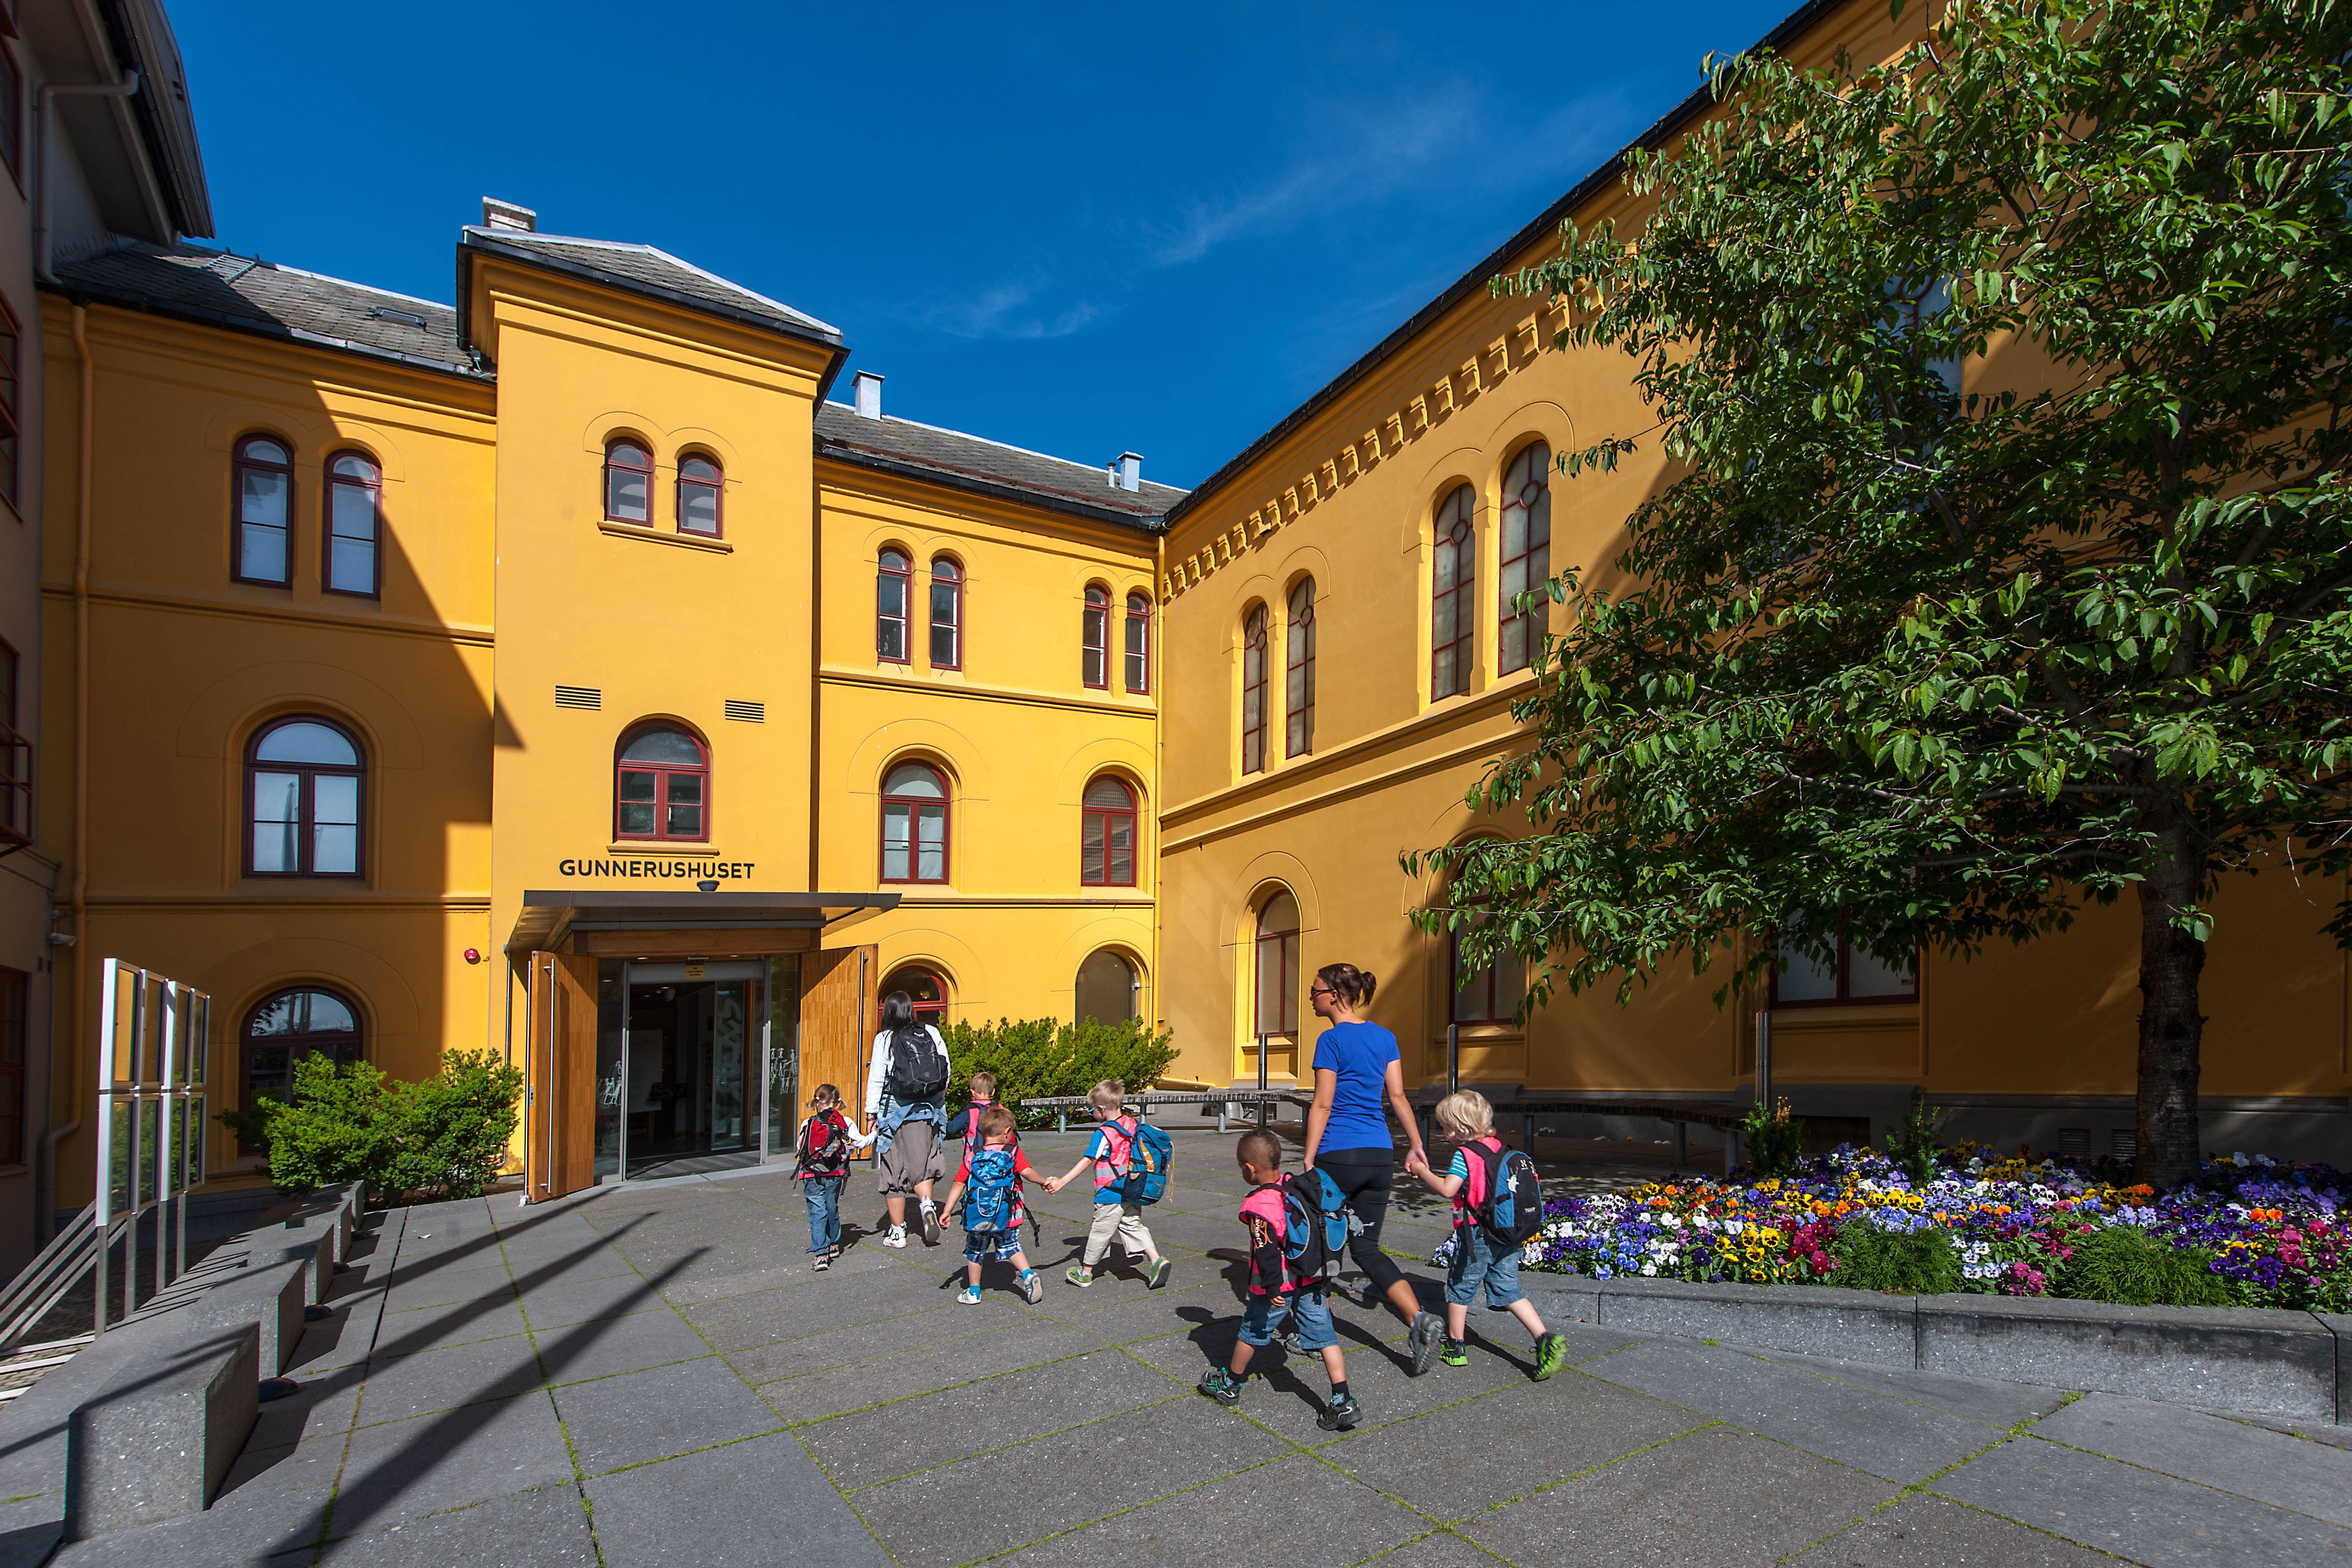 NTNU VItenskapsmuseet/Åge Hojem, Fasaden av NTNU Vitenskapsmuseet i Trondheim